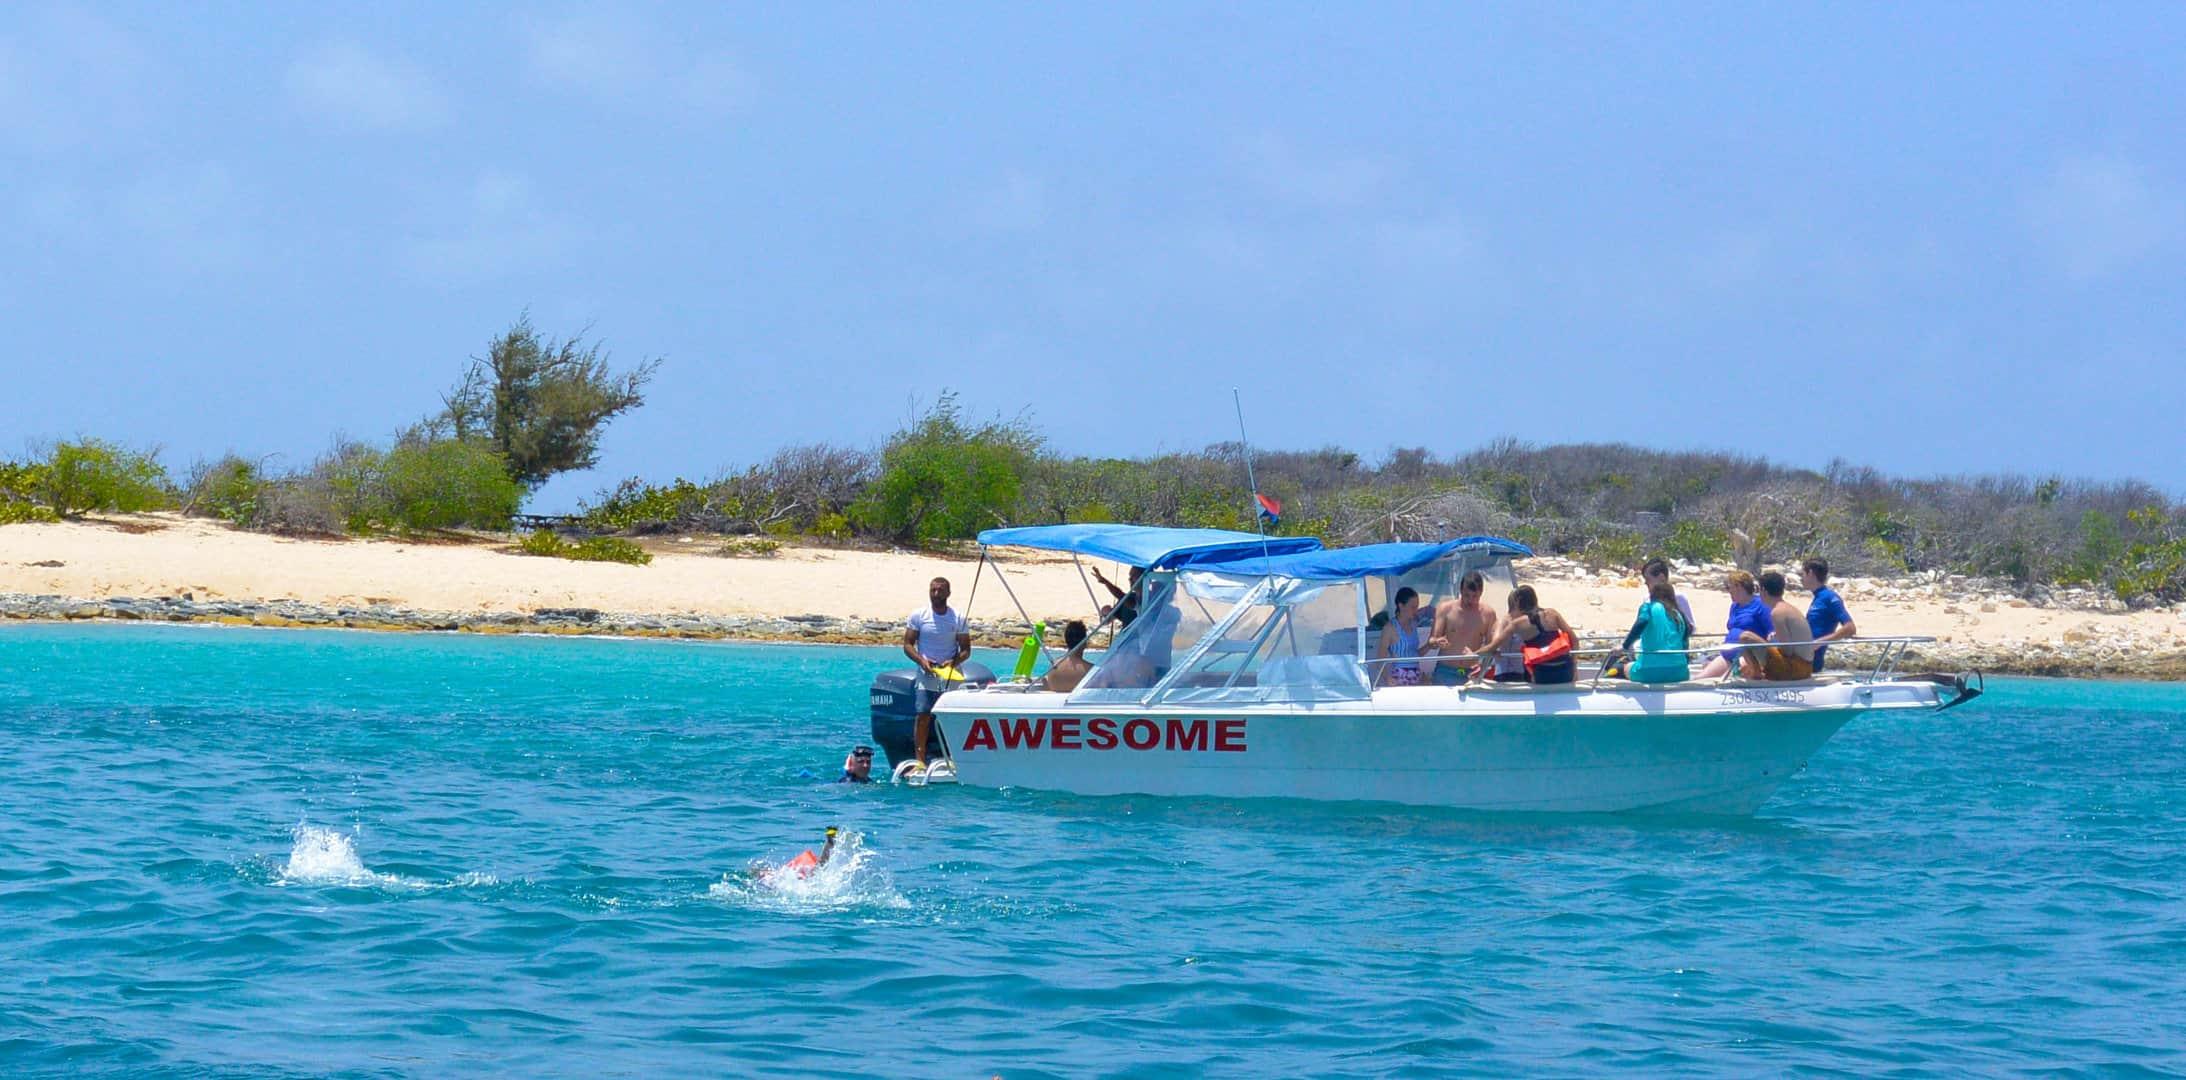 three island snorkeling and